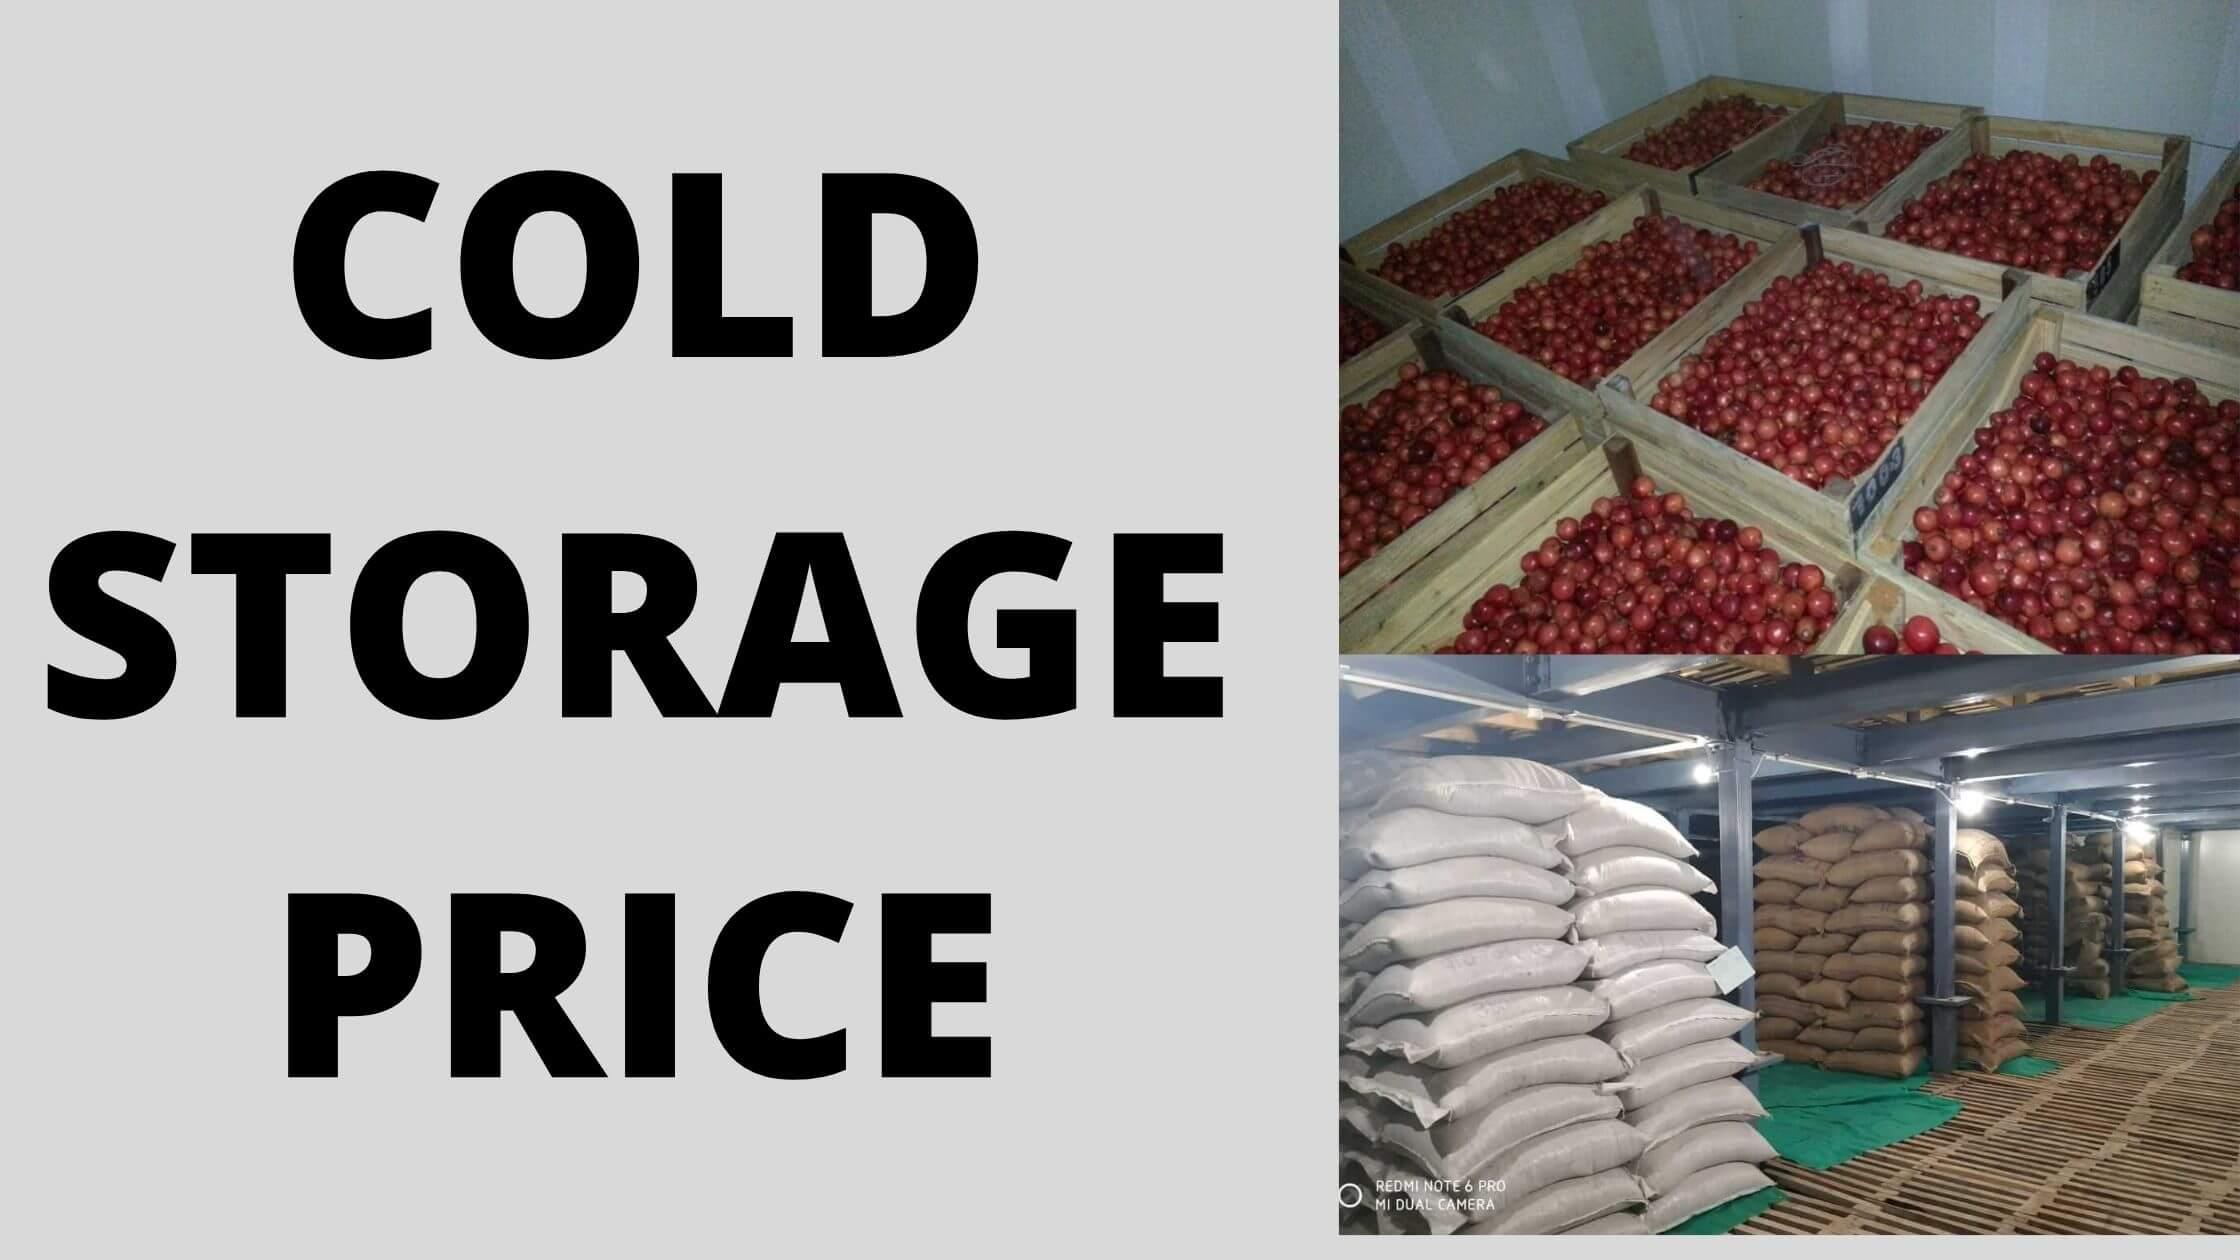 Cold Storage Price